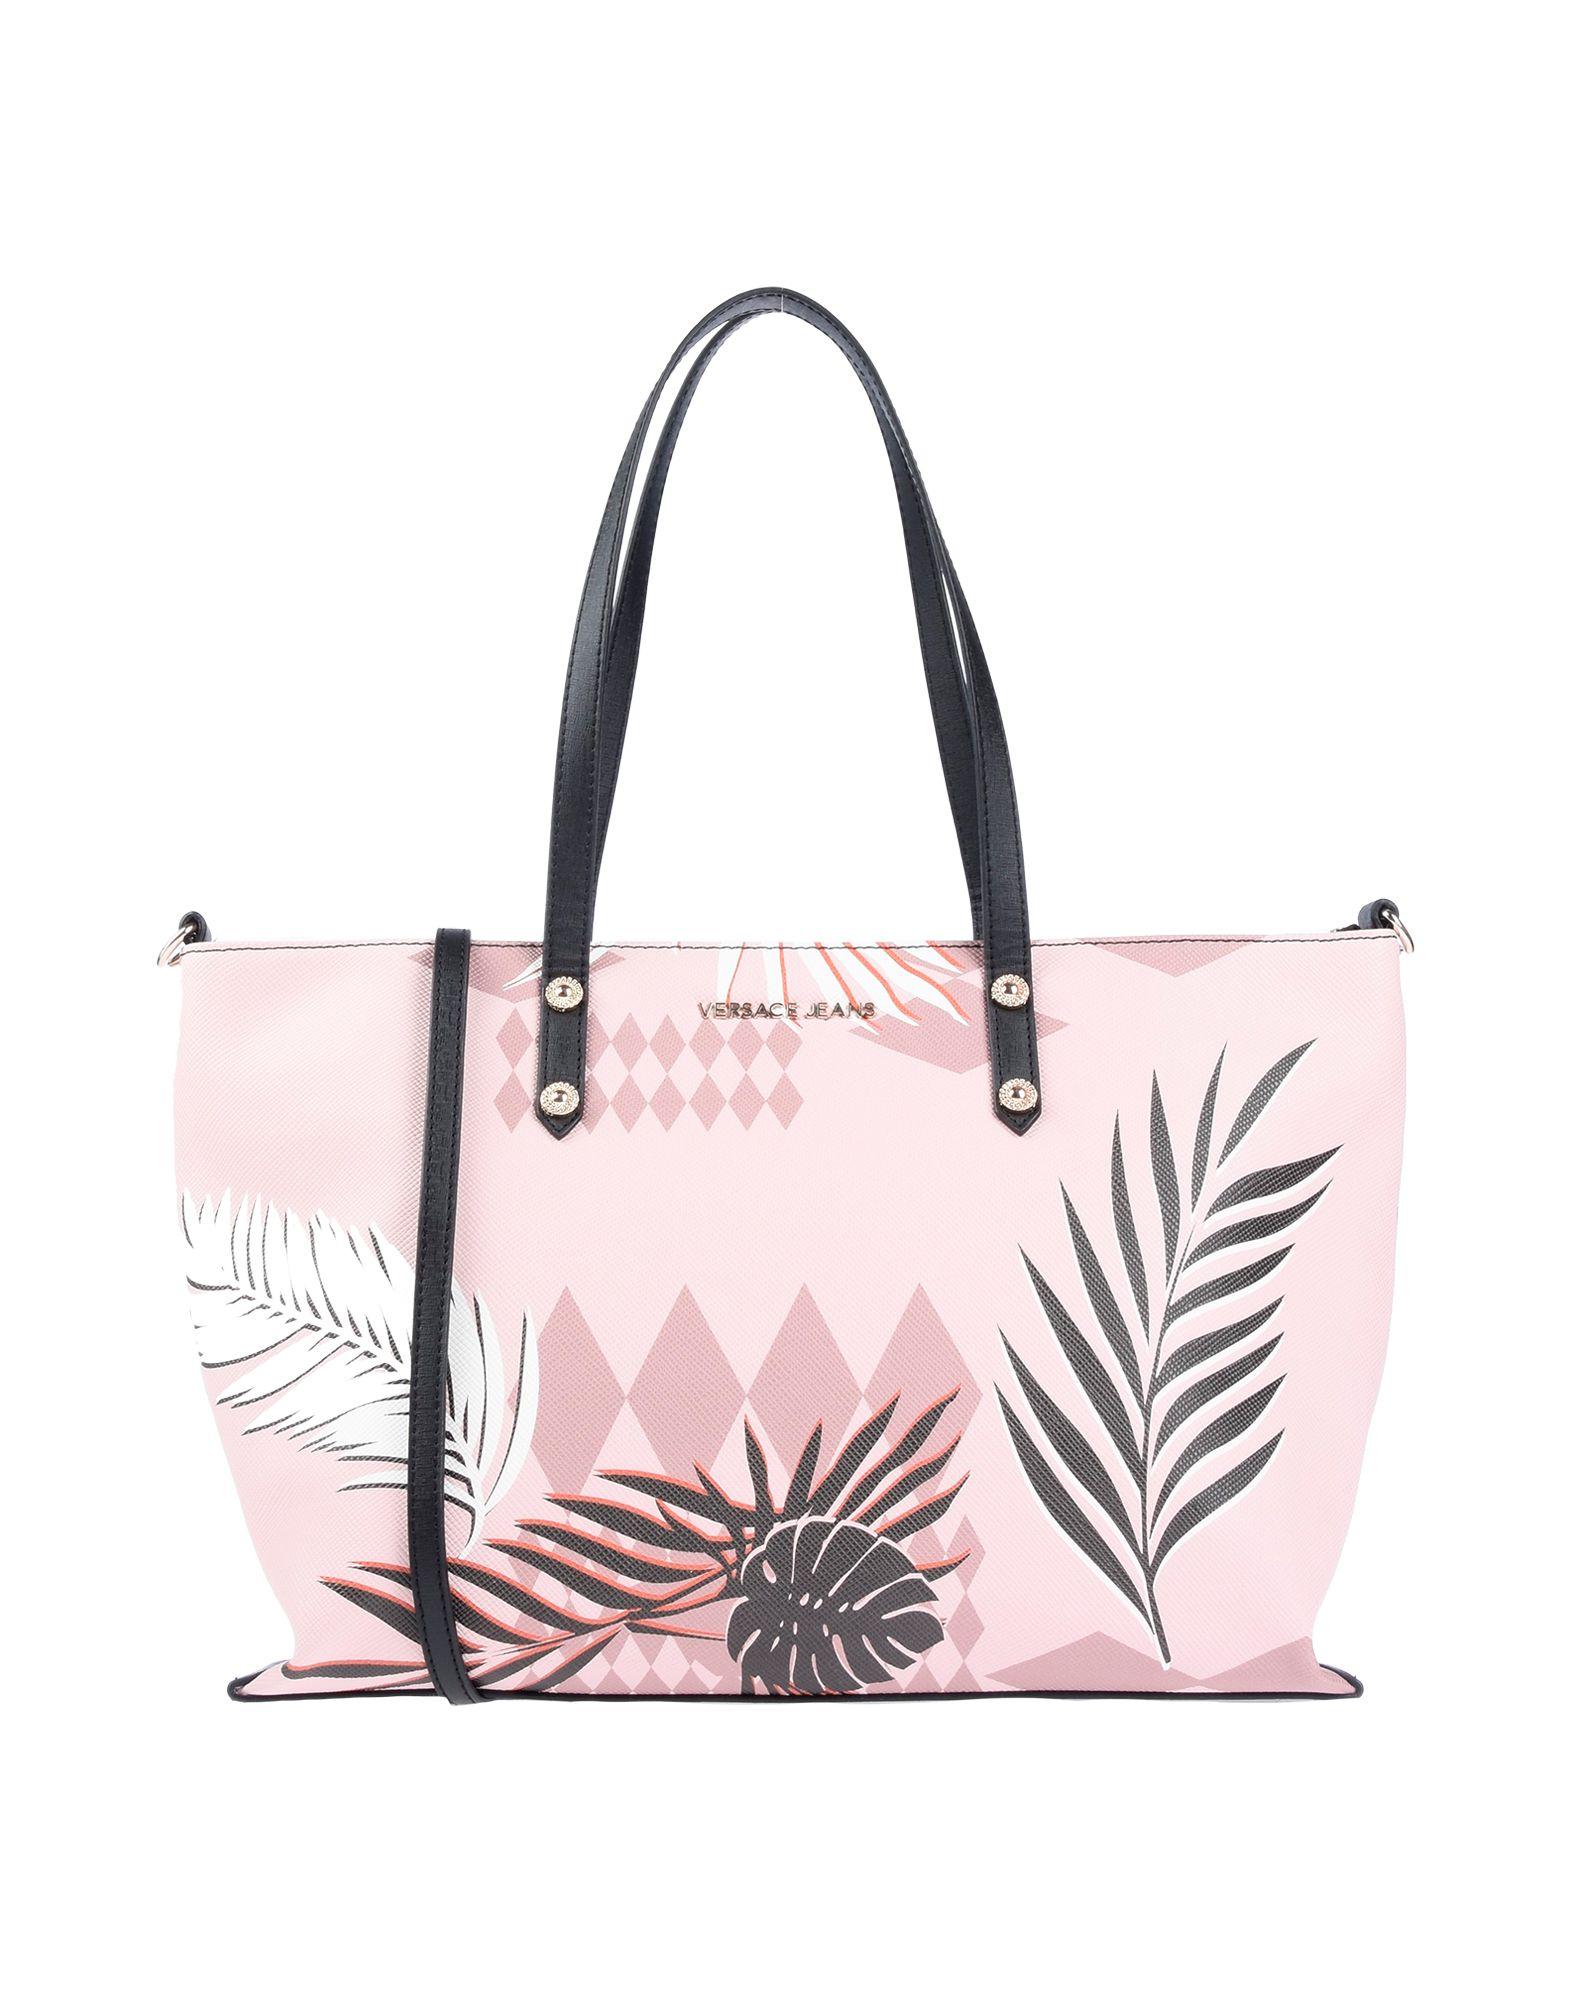 Shop Versace Jeans Handbags In Pink e8a411fae29b5